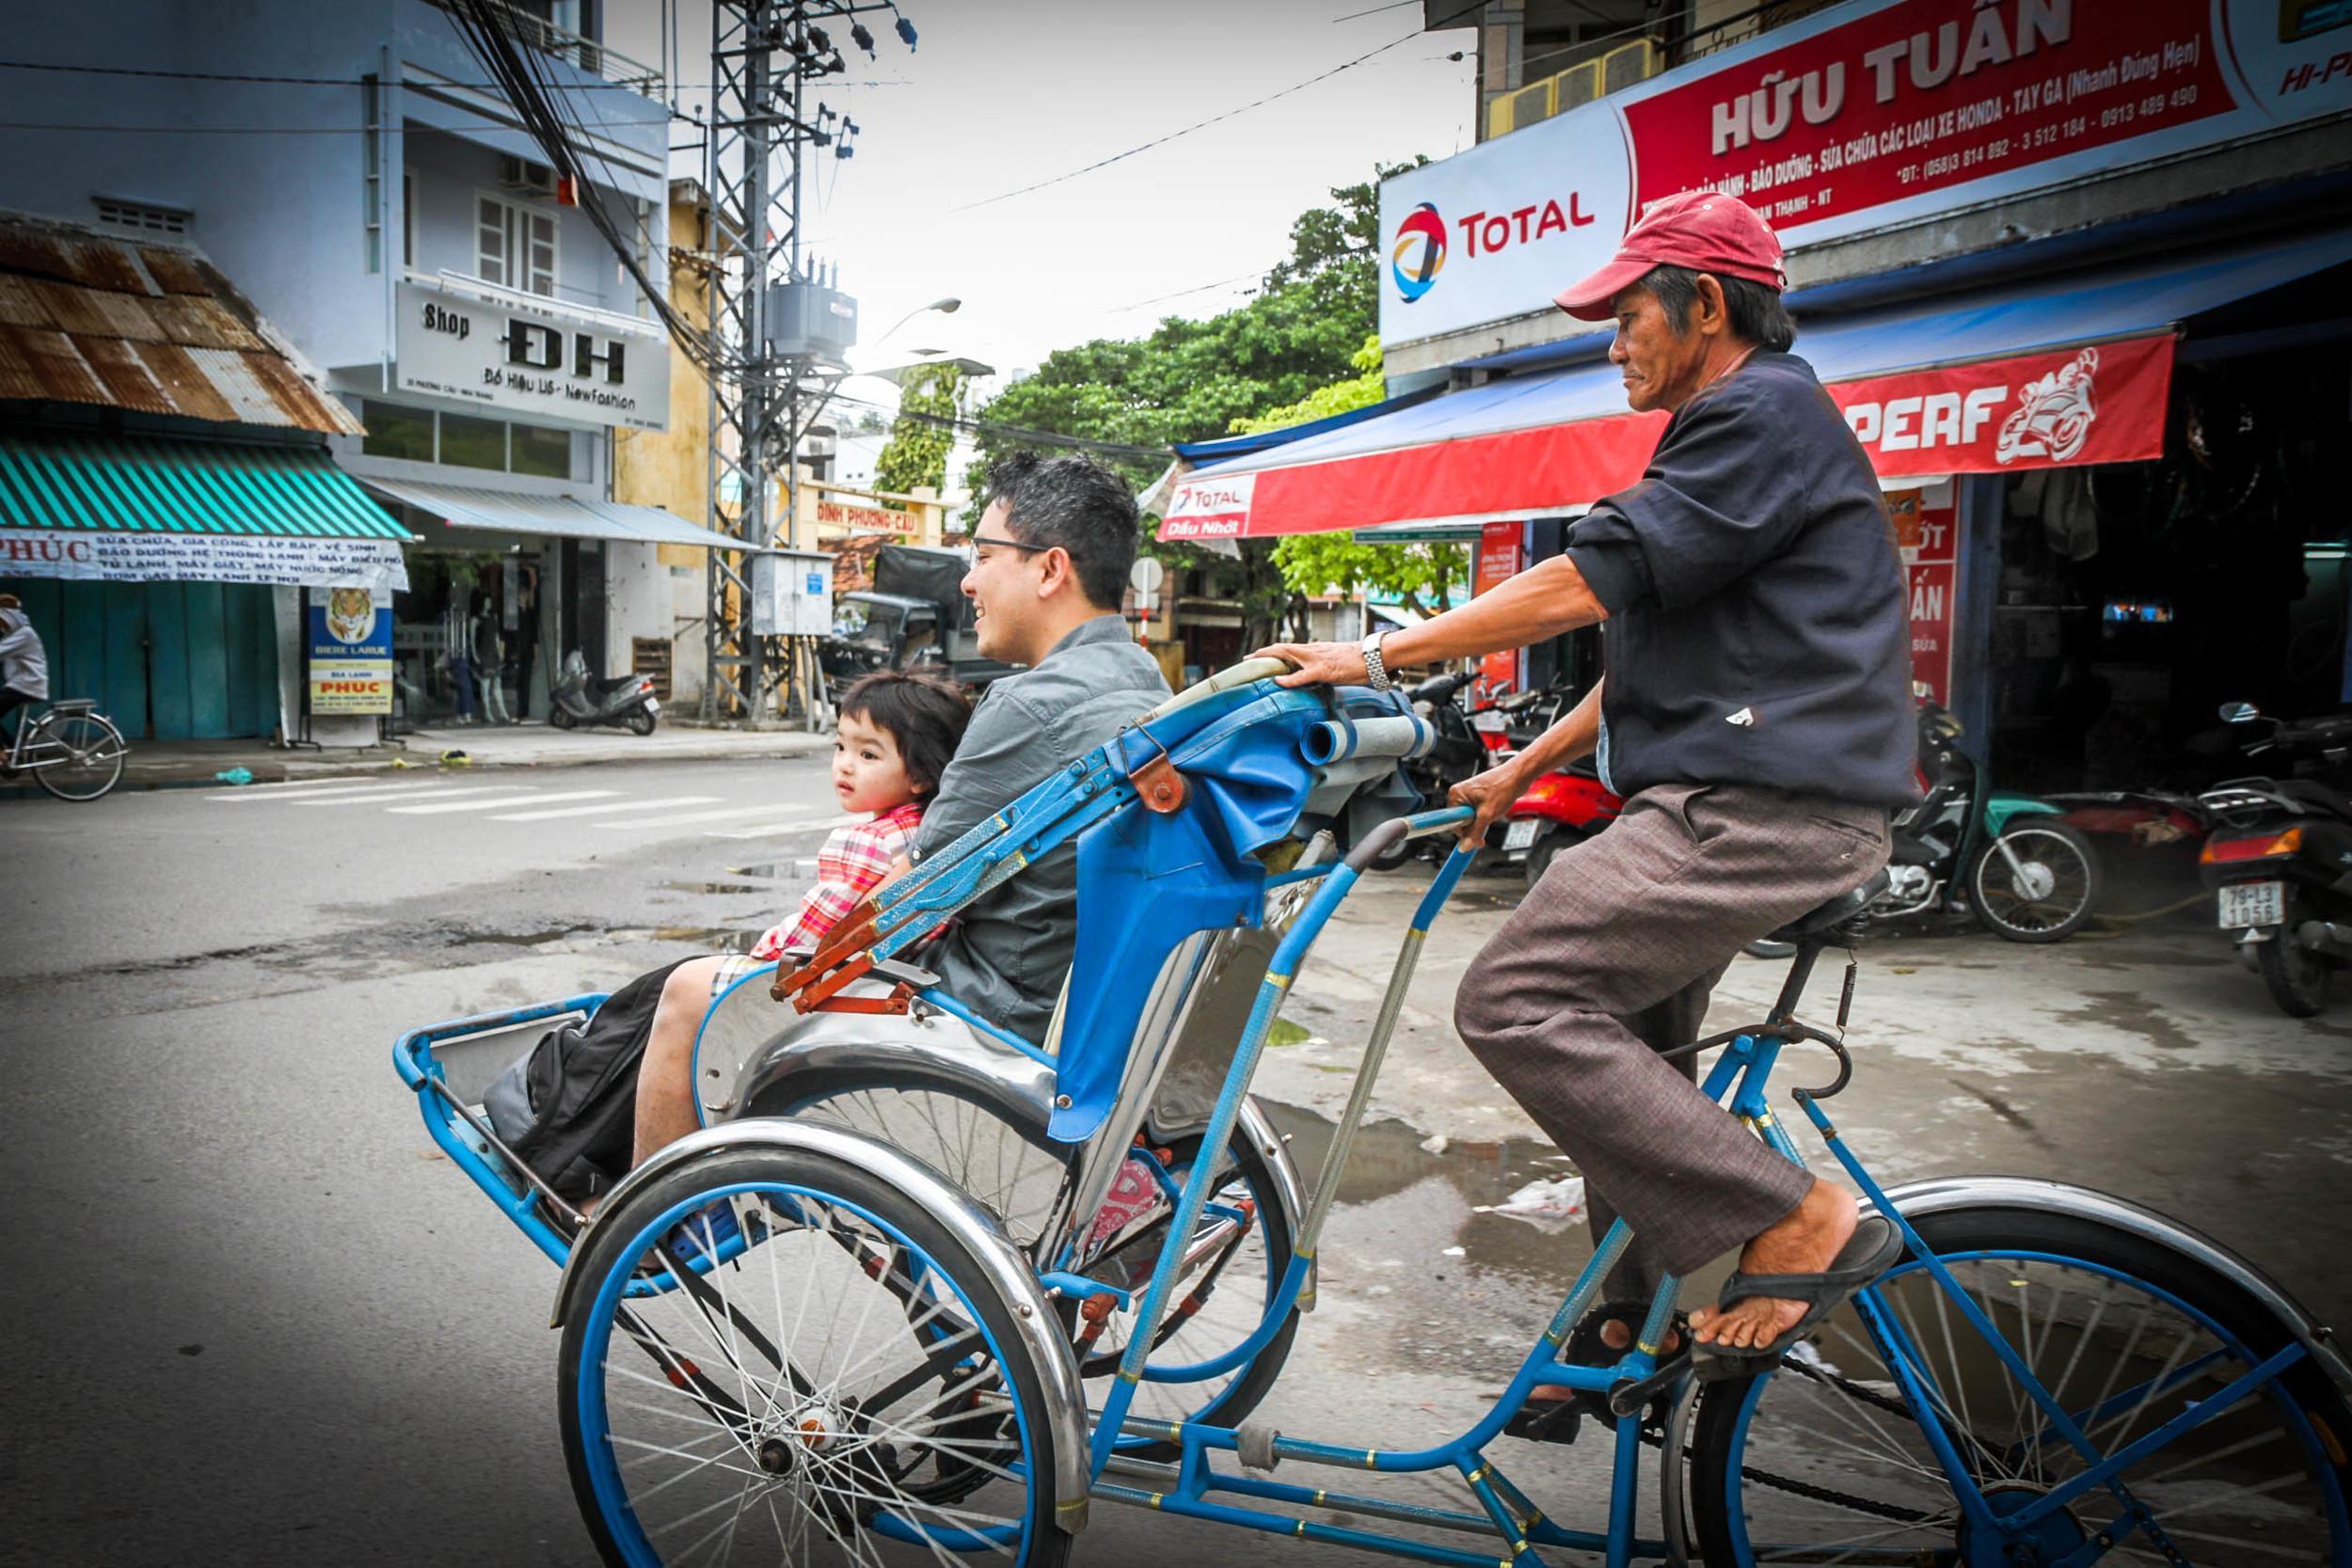 Taking tour of Nha Trang via Xich Lo, Vietnamese pedicabs.